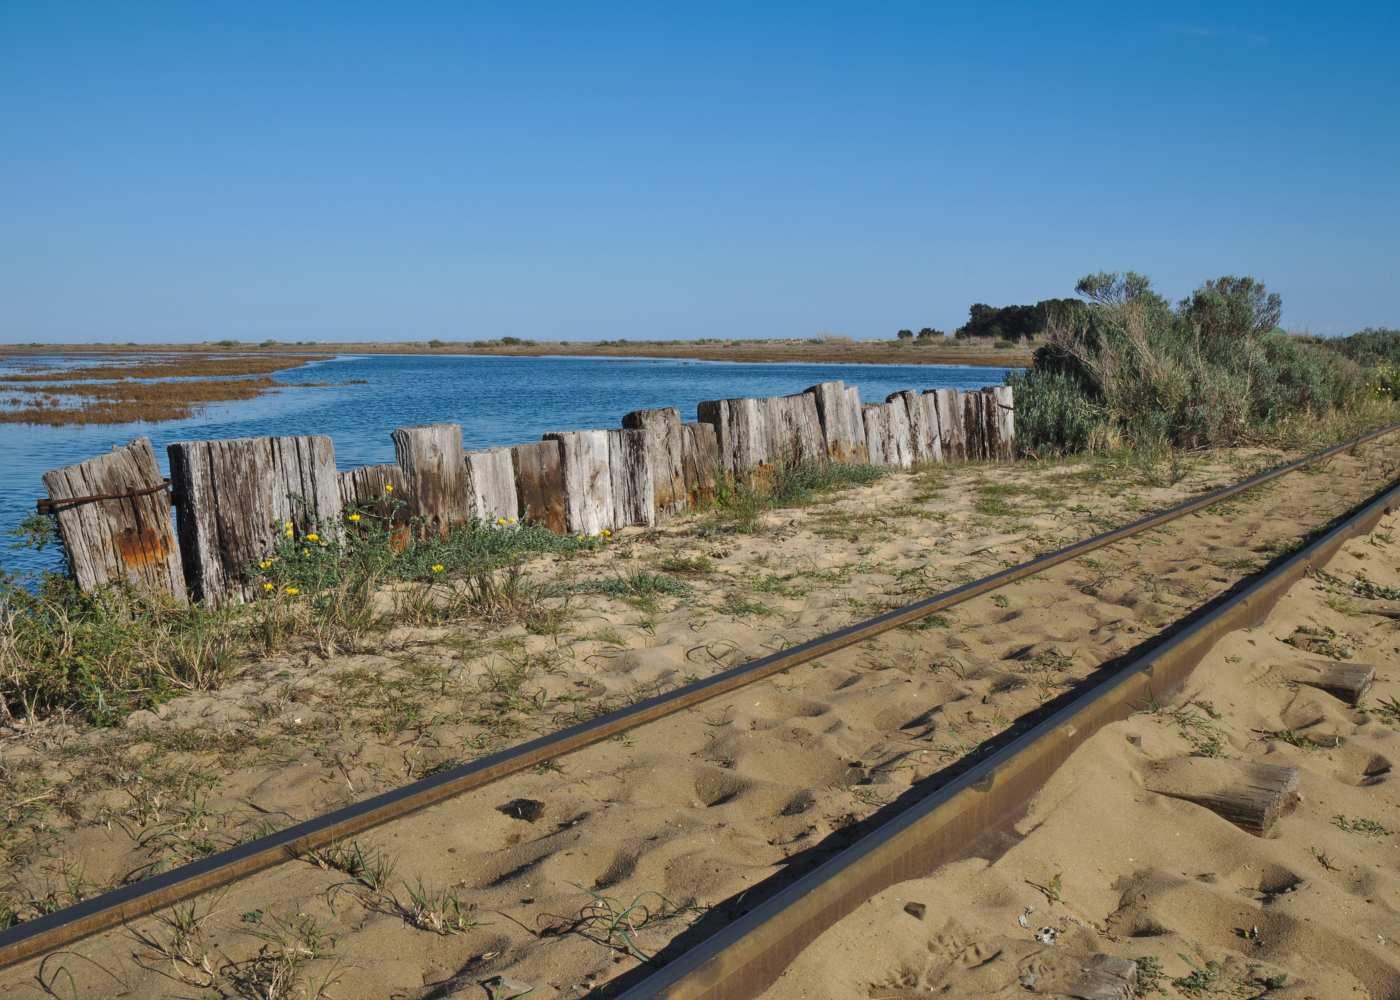 Comboio nas praias algarvias